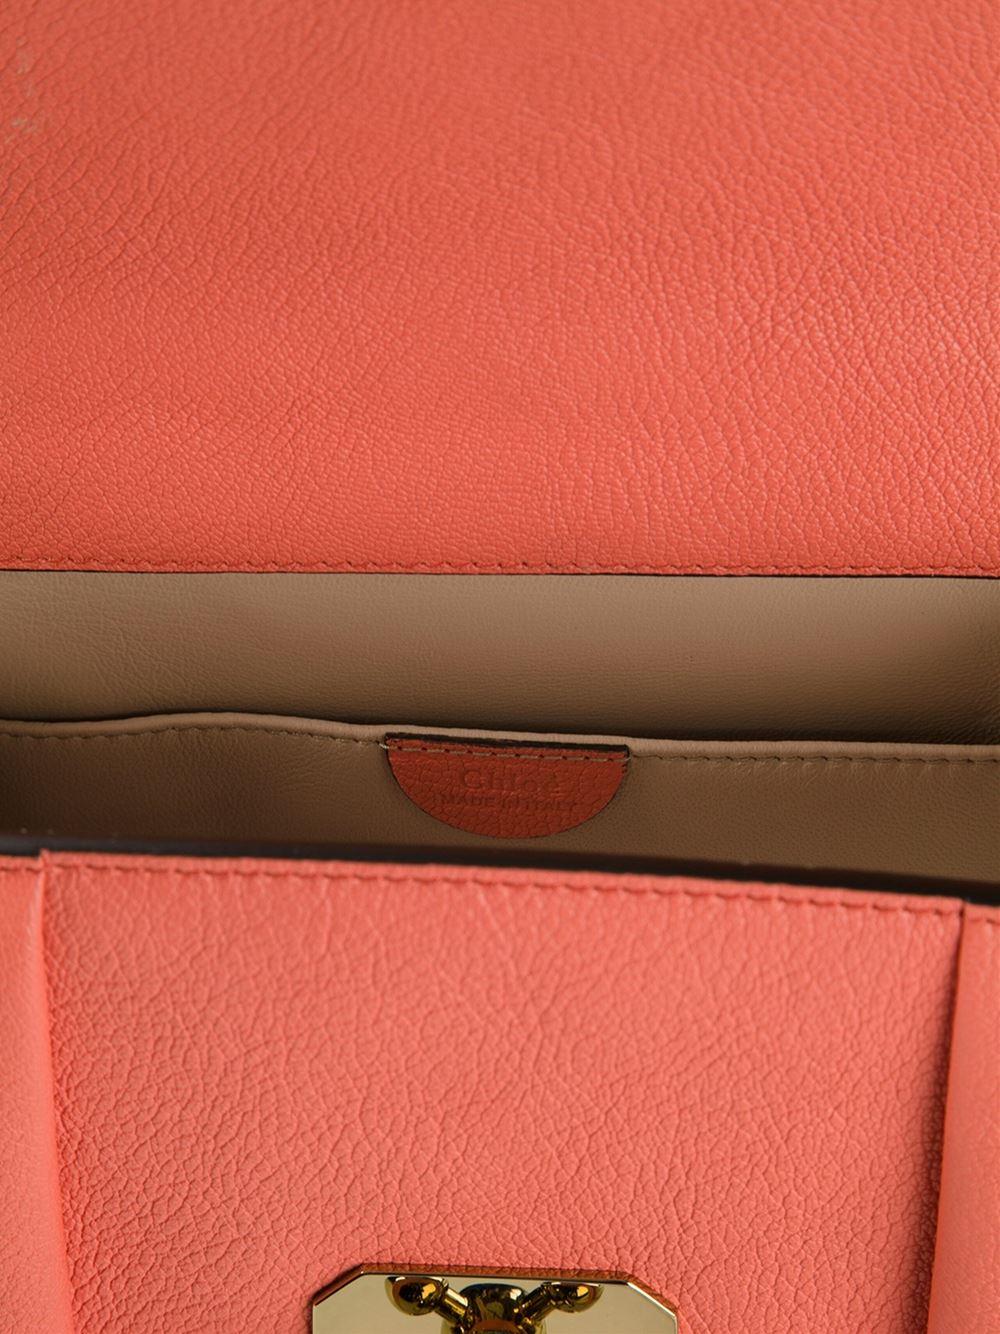 Chlo¨¦ Elsie Leather Cross-Body Bag in Pink (yellow \u0026amp; orange) | Lyst